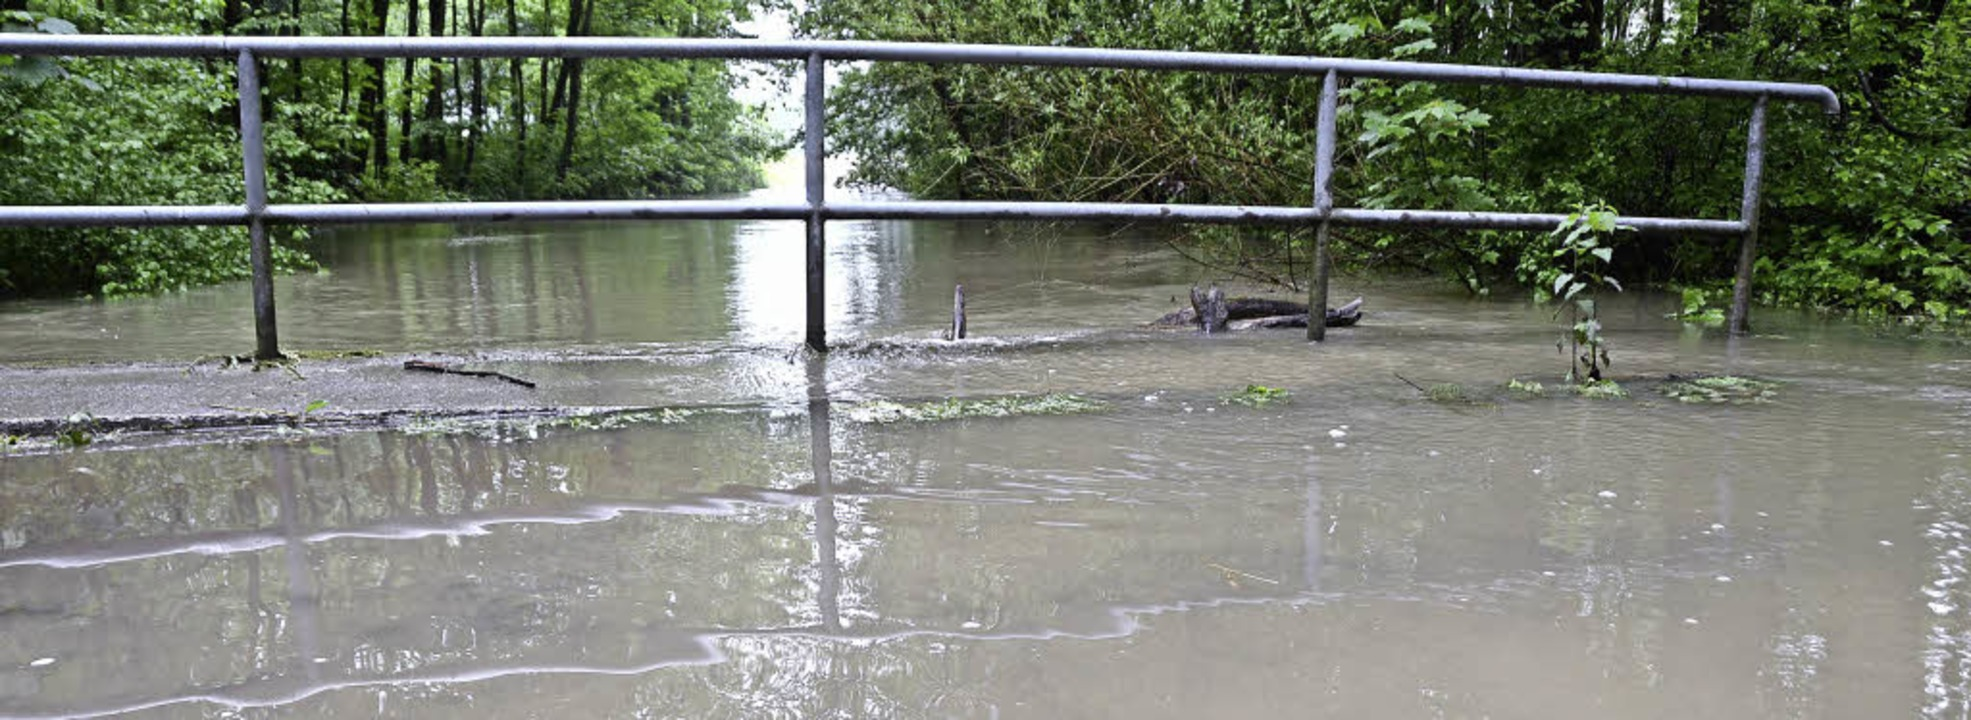 Jechtingen.  Mehr als 30 Zentimter war...ke im Wald bei  Jechtingen überflutet.  | Foto: Roland Vitt